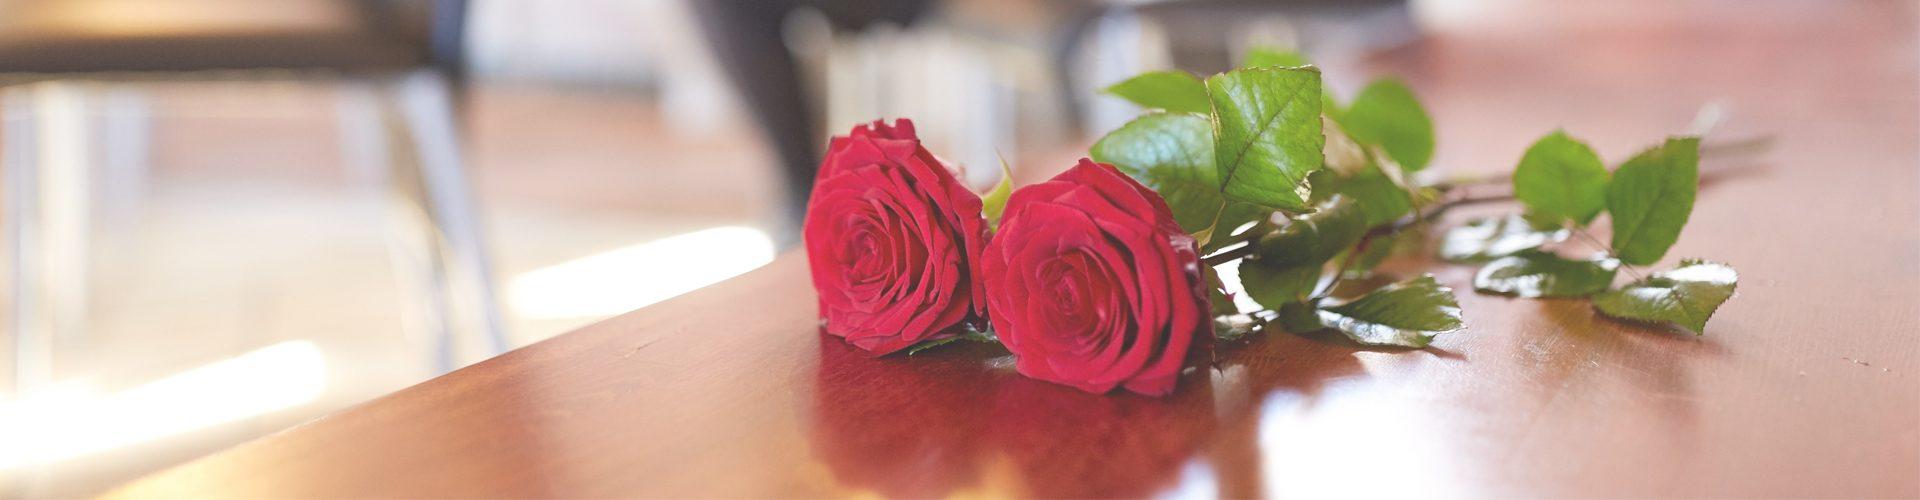 ten years on - bereavement